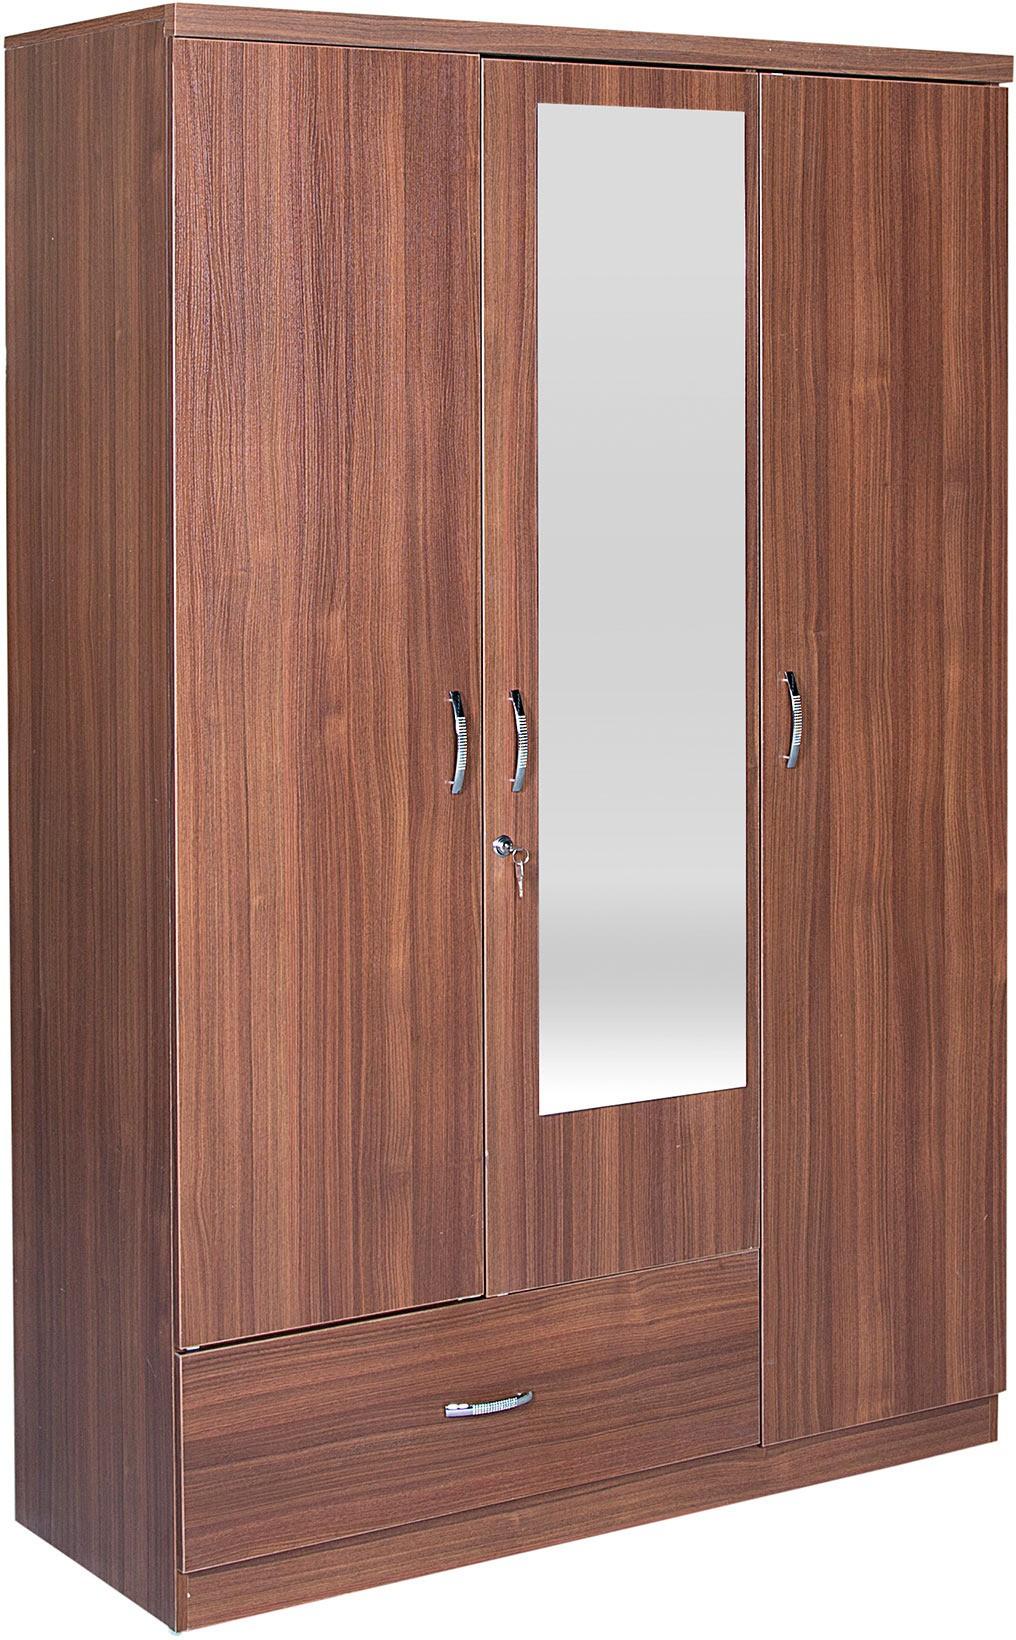 Hometown Ultima 3 Door With Mirror Rwlnt Engineered Wood Almirah Finish Color Regato Walnut Furniture Price In Indian Cities Chennai Bangalore Mumbai Delhi And Kolkata Live Hometown Ultima 3 Door With Mirror